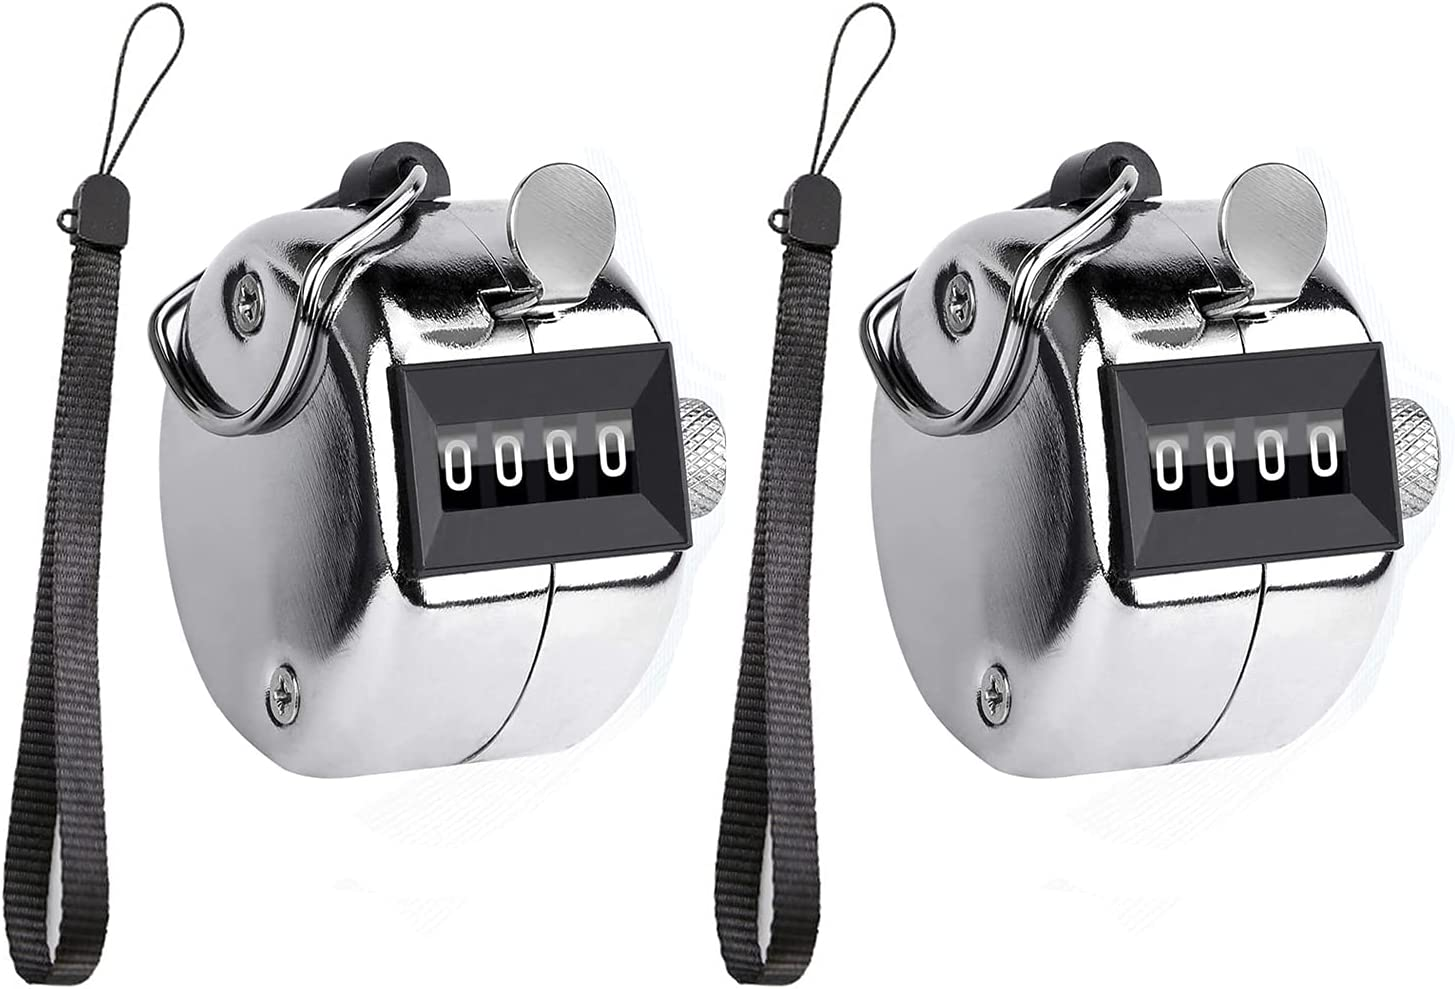 ZRAMO low-pricing Metal Hand 4-Digit Tally Counter Dig Clicker Palm Regular dealer